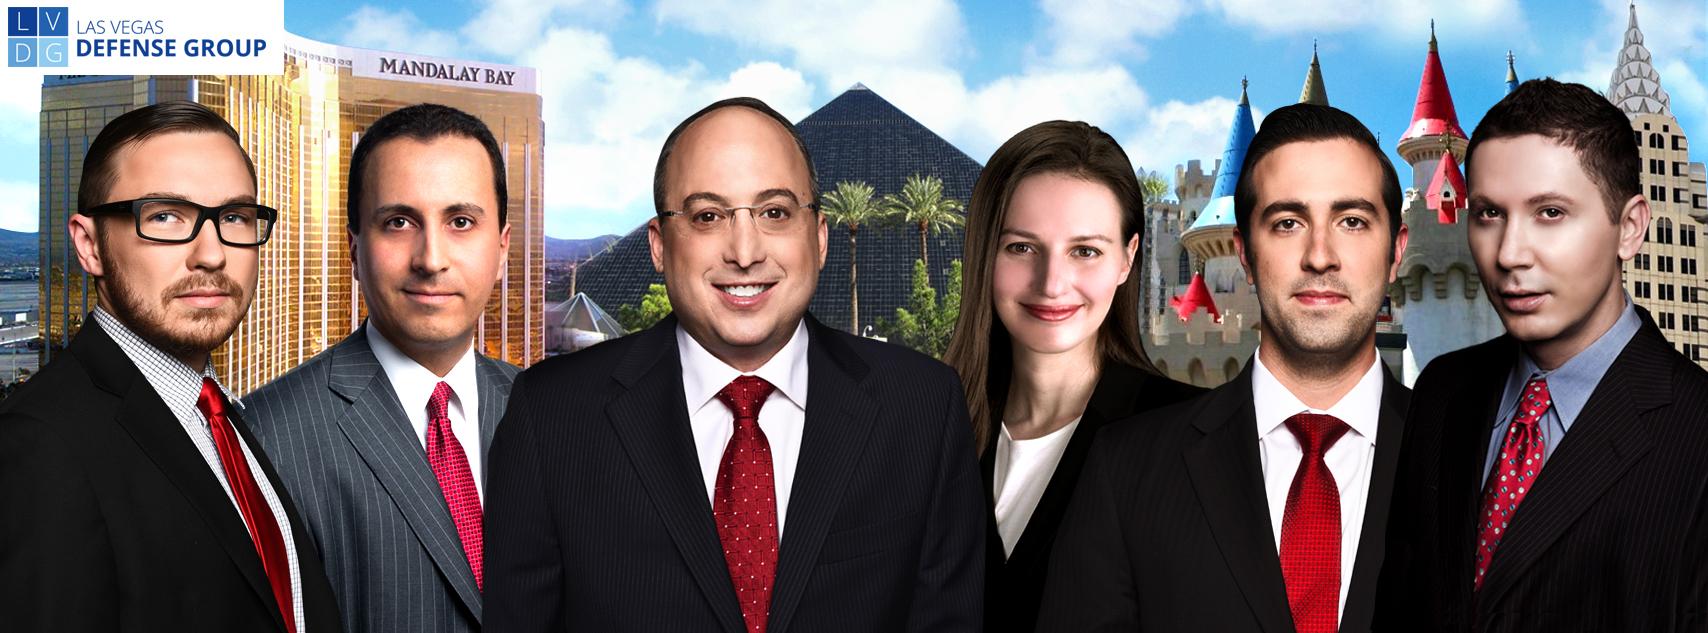 Las Vegas Defense Group | Lawyers in 2970 W Sahara Ave - Las Vegas NV - Reviews - Photos - Phone Number